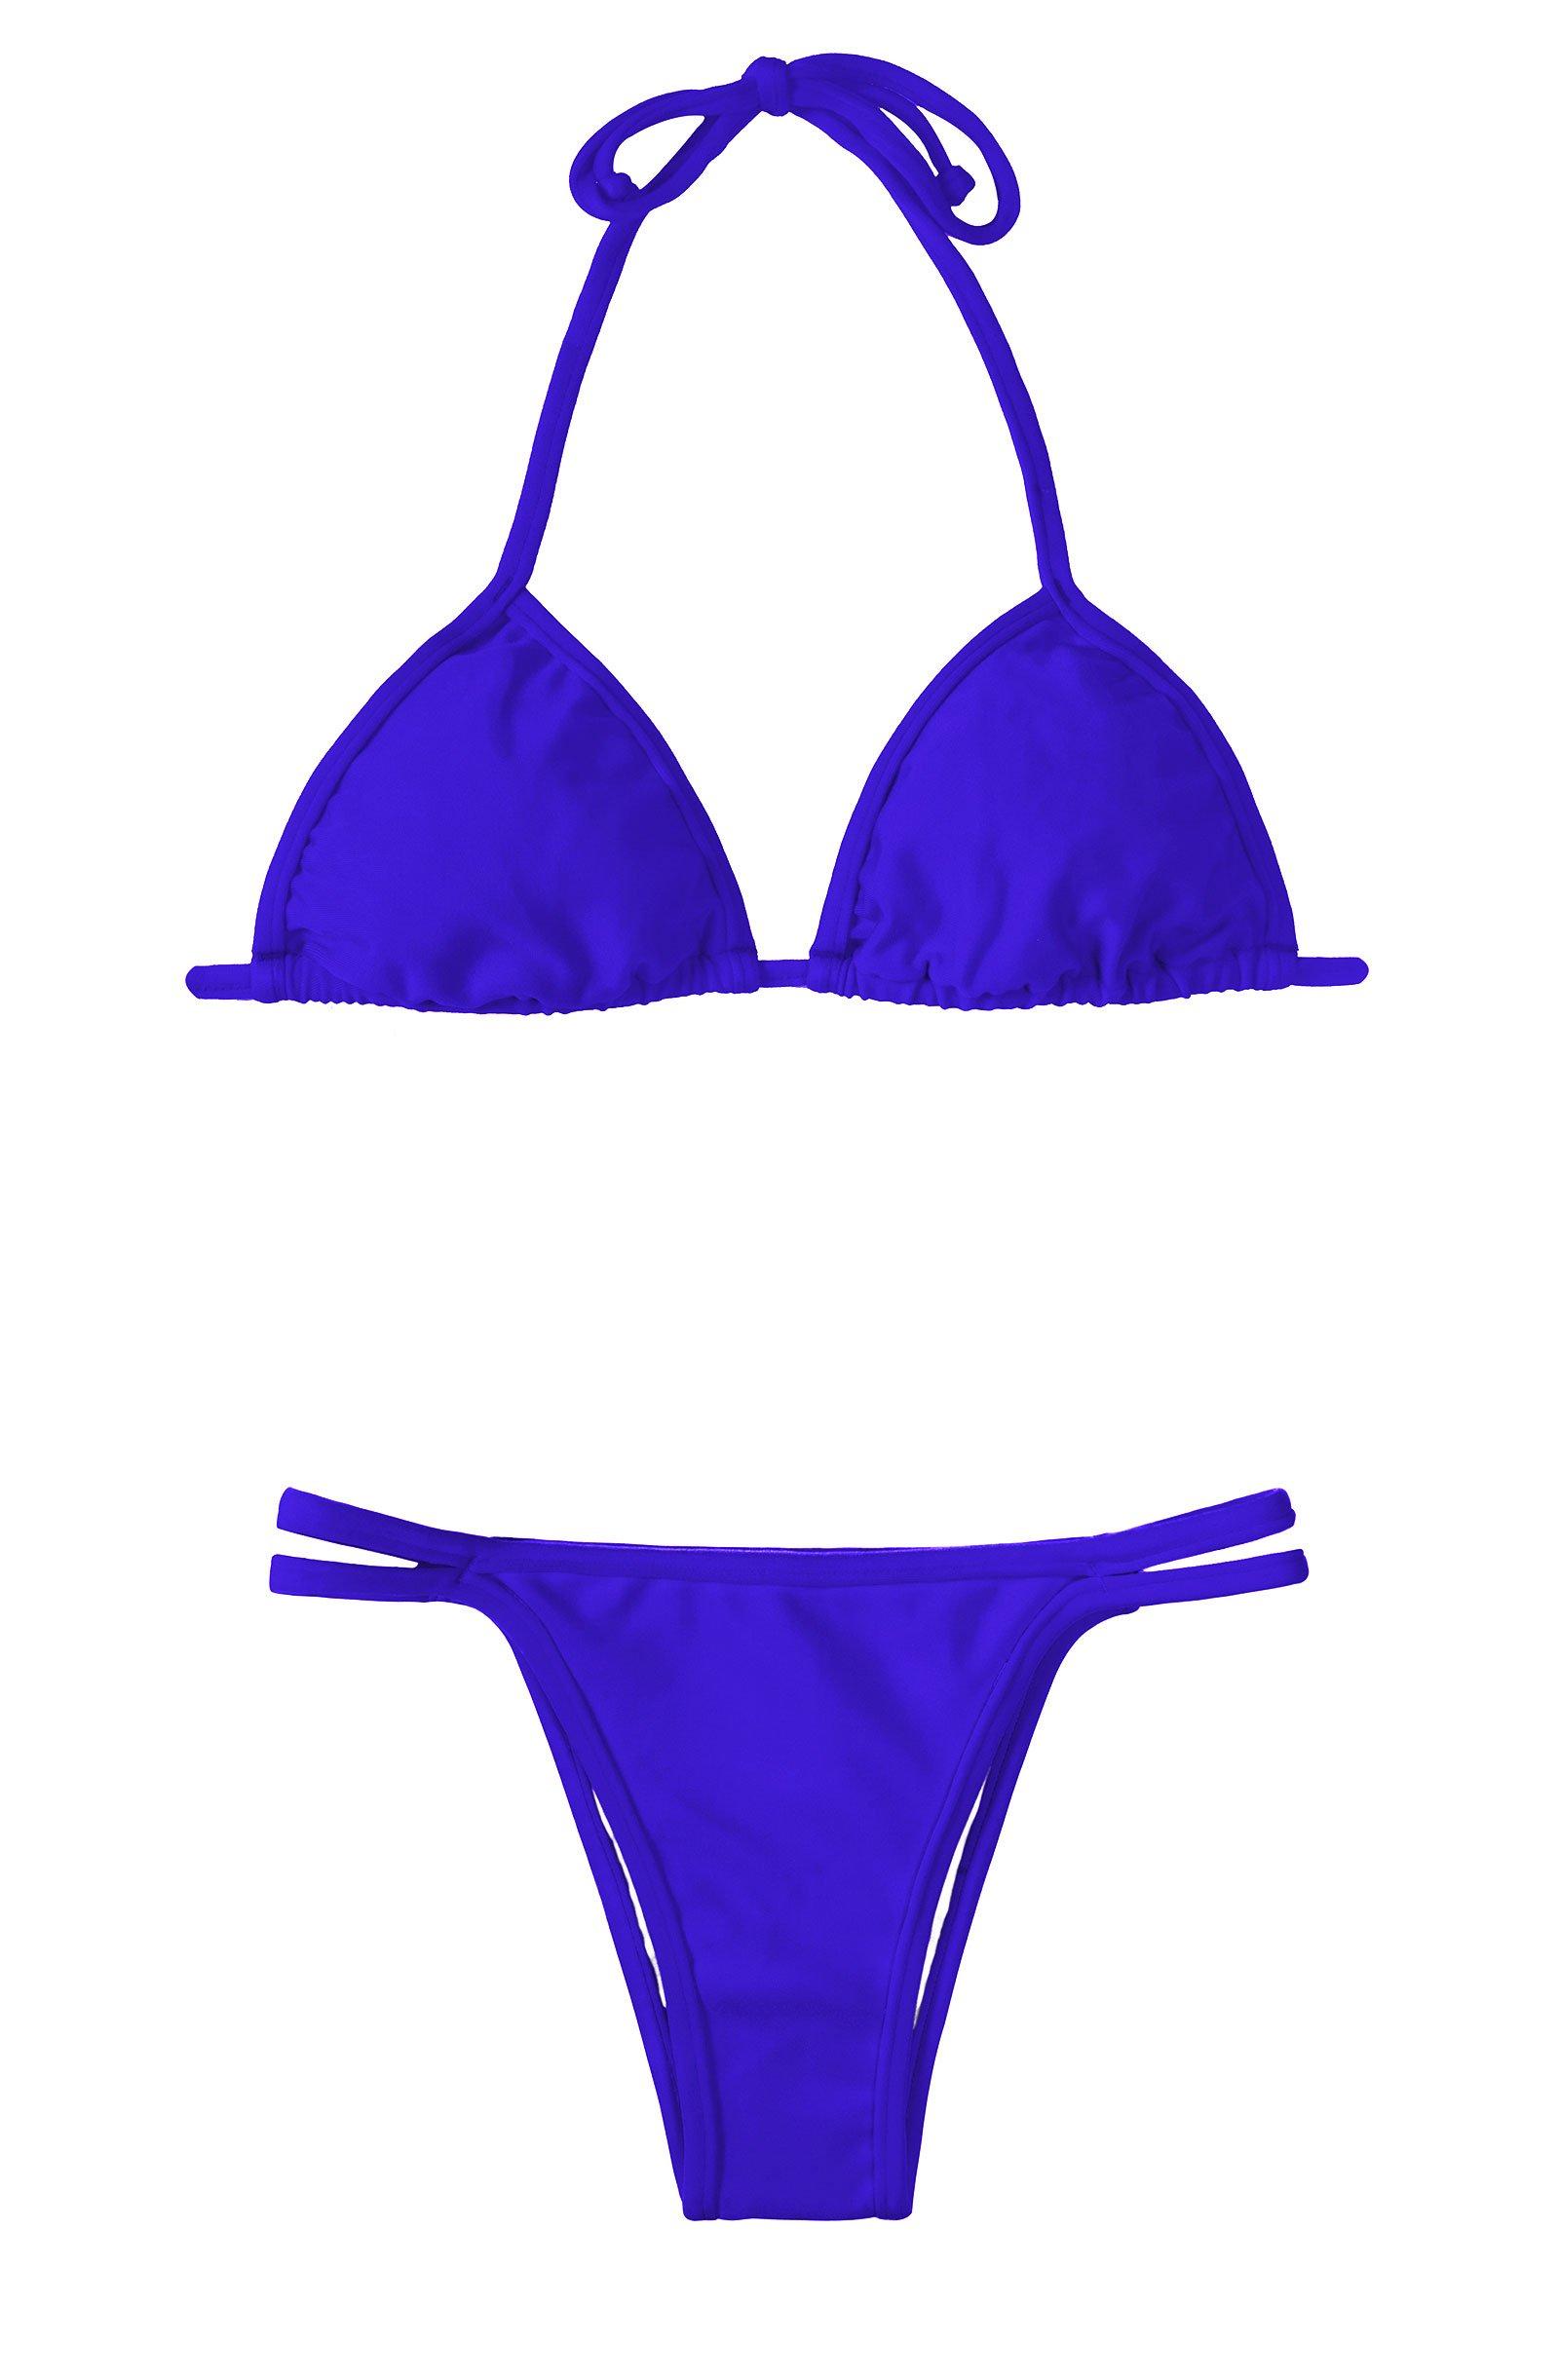 Rich Blue Triangle Bikini, Bottom With Double Fixed Ties - Zaffiro Cort Duo